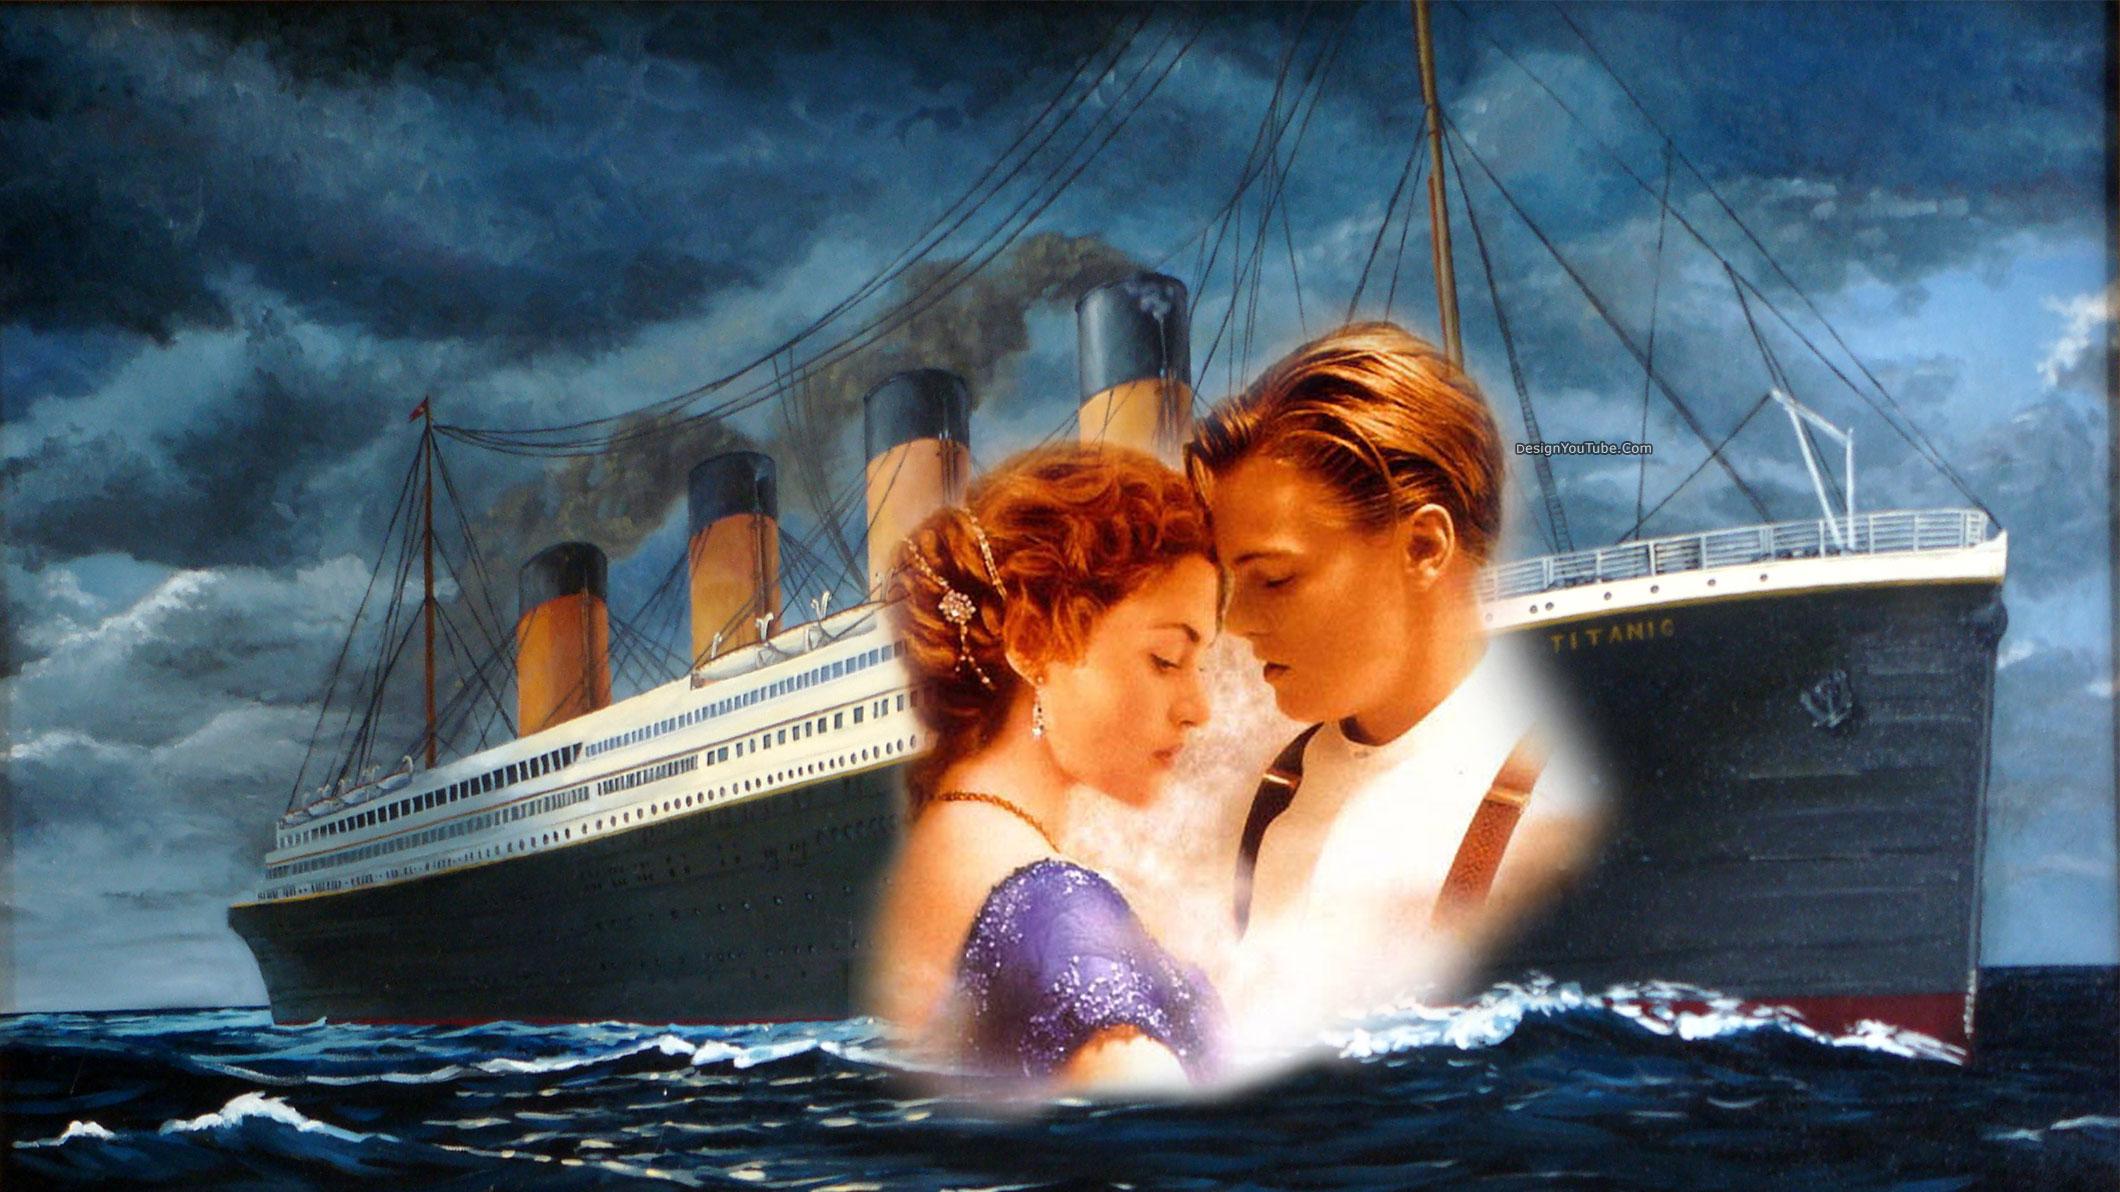 Titanic | just b.CAUSE